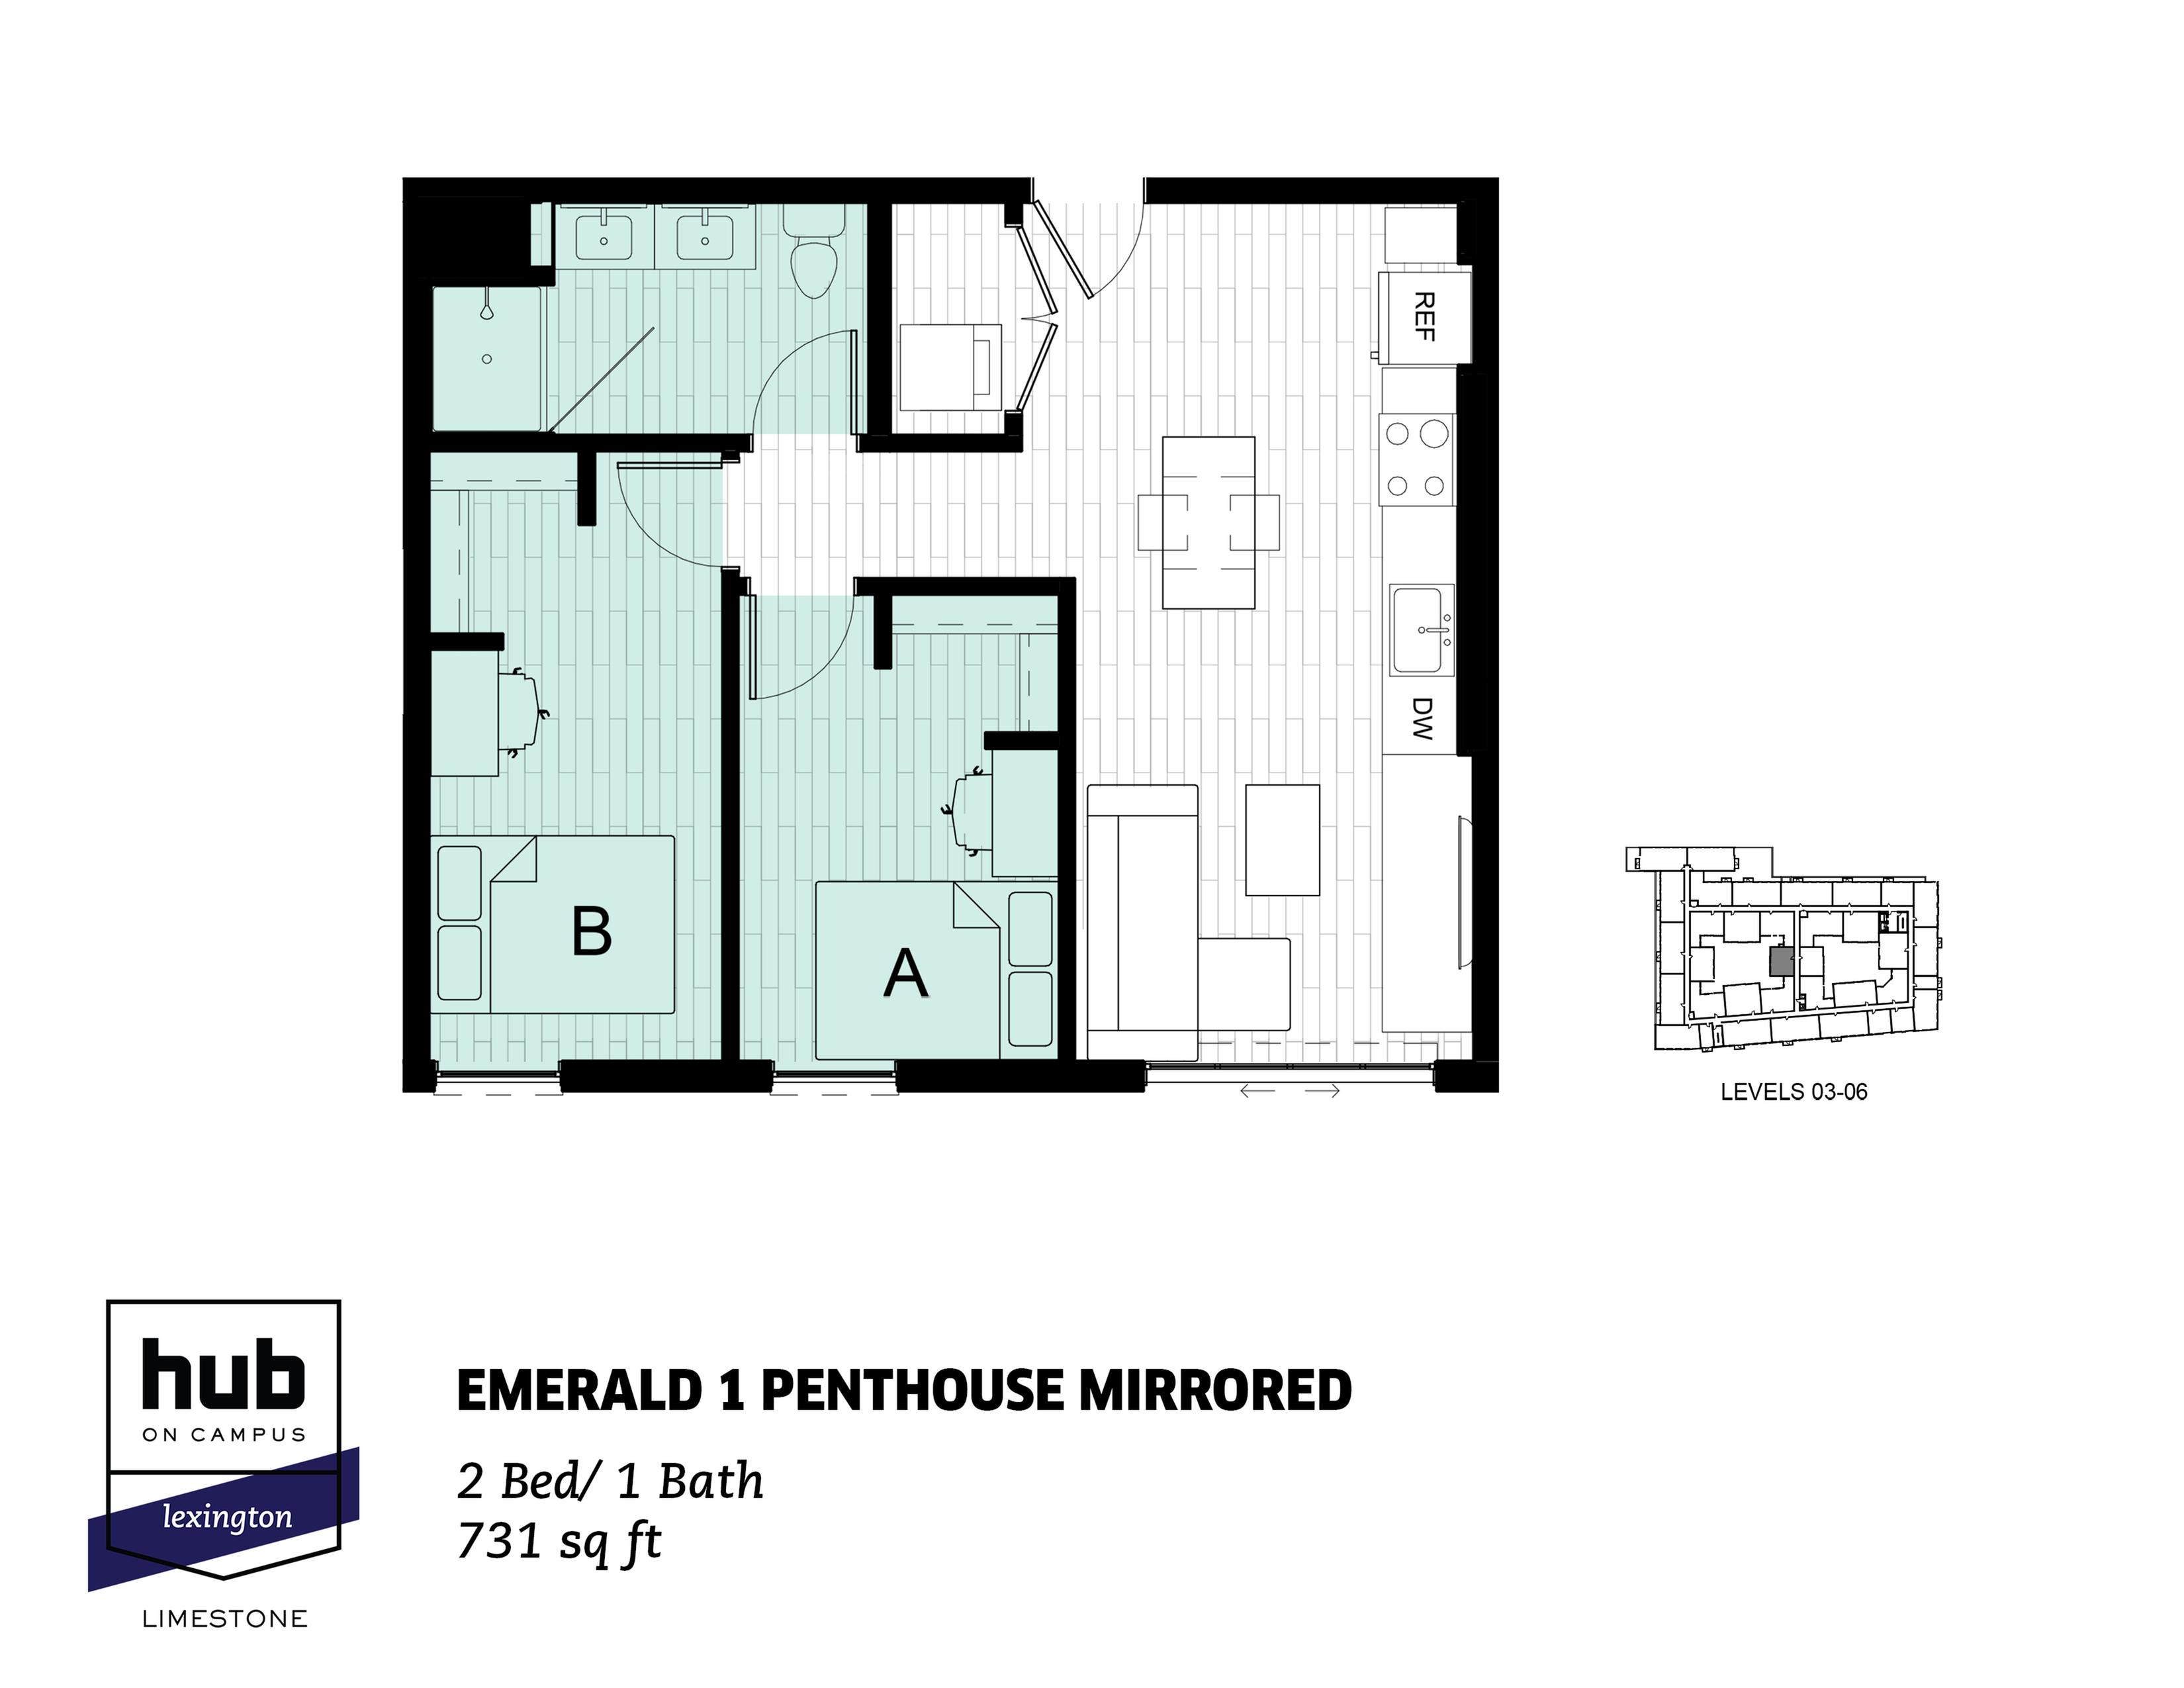 Emerald 1 Penthouse Mirrored